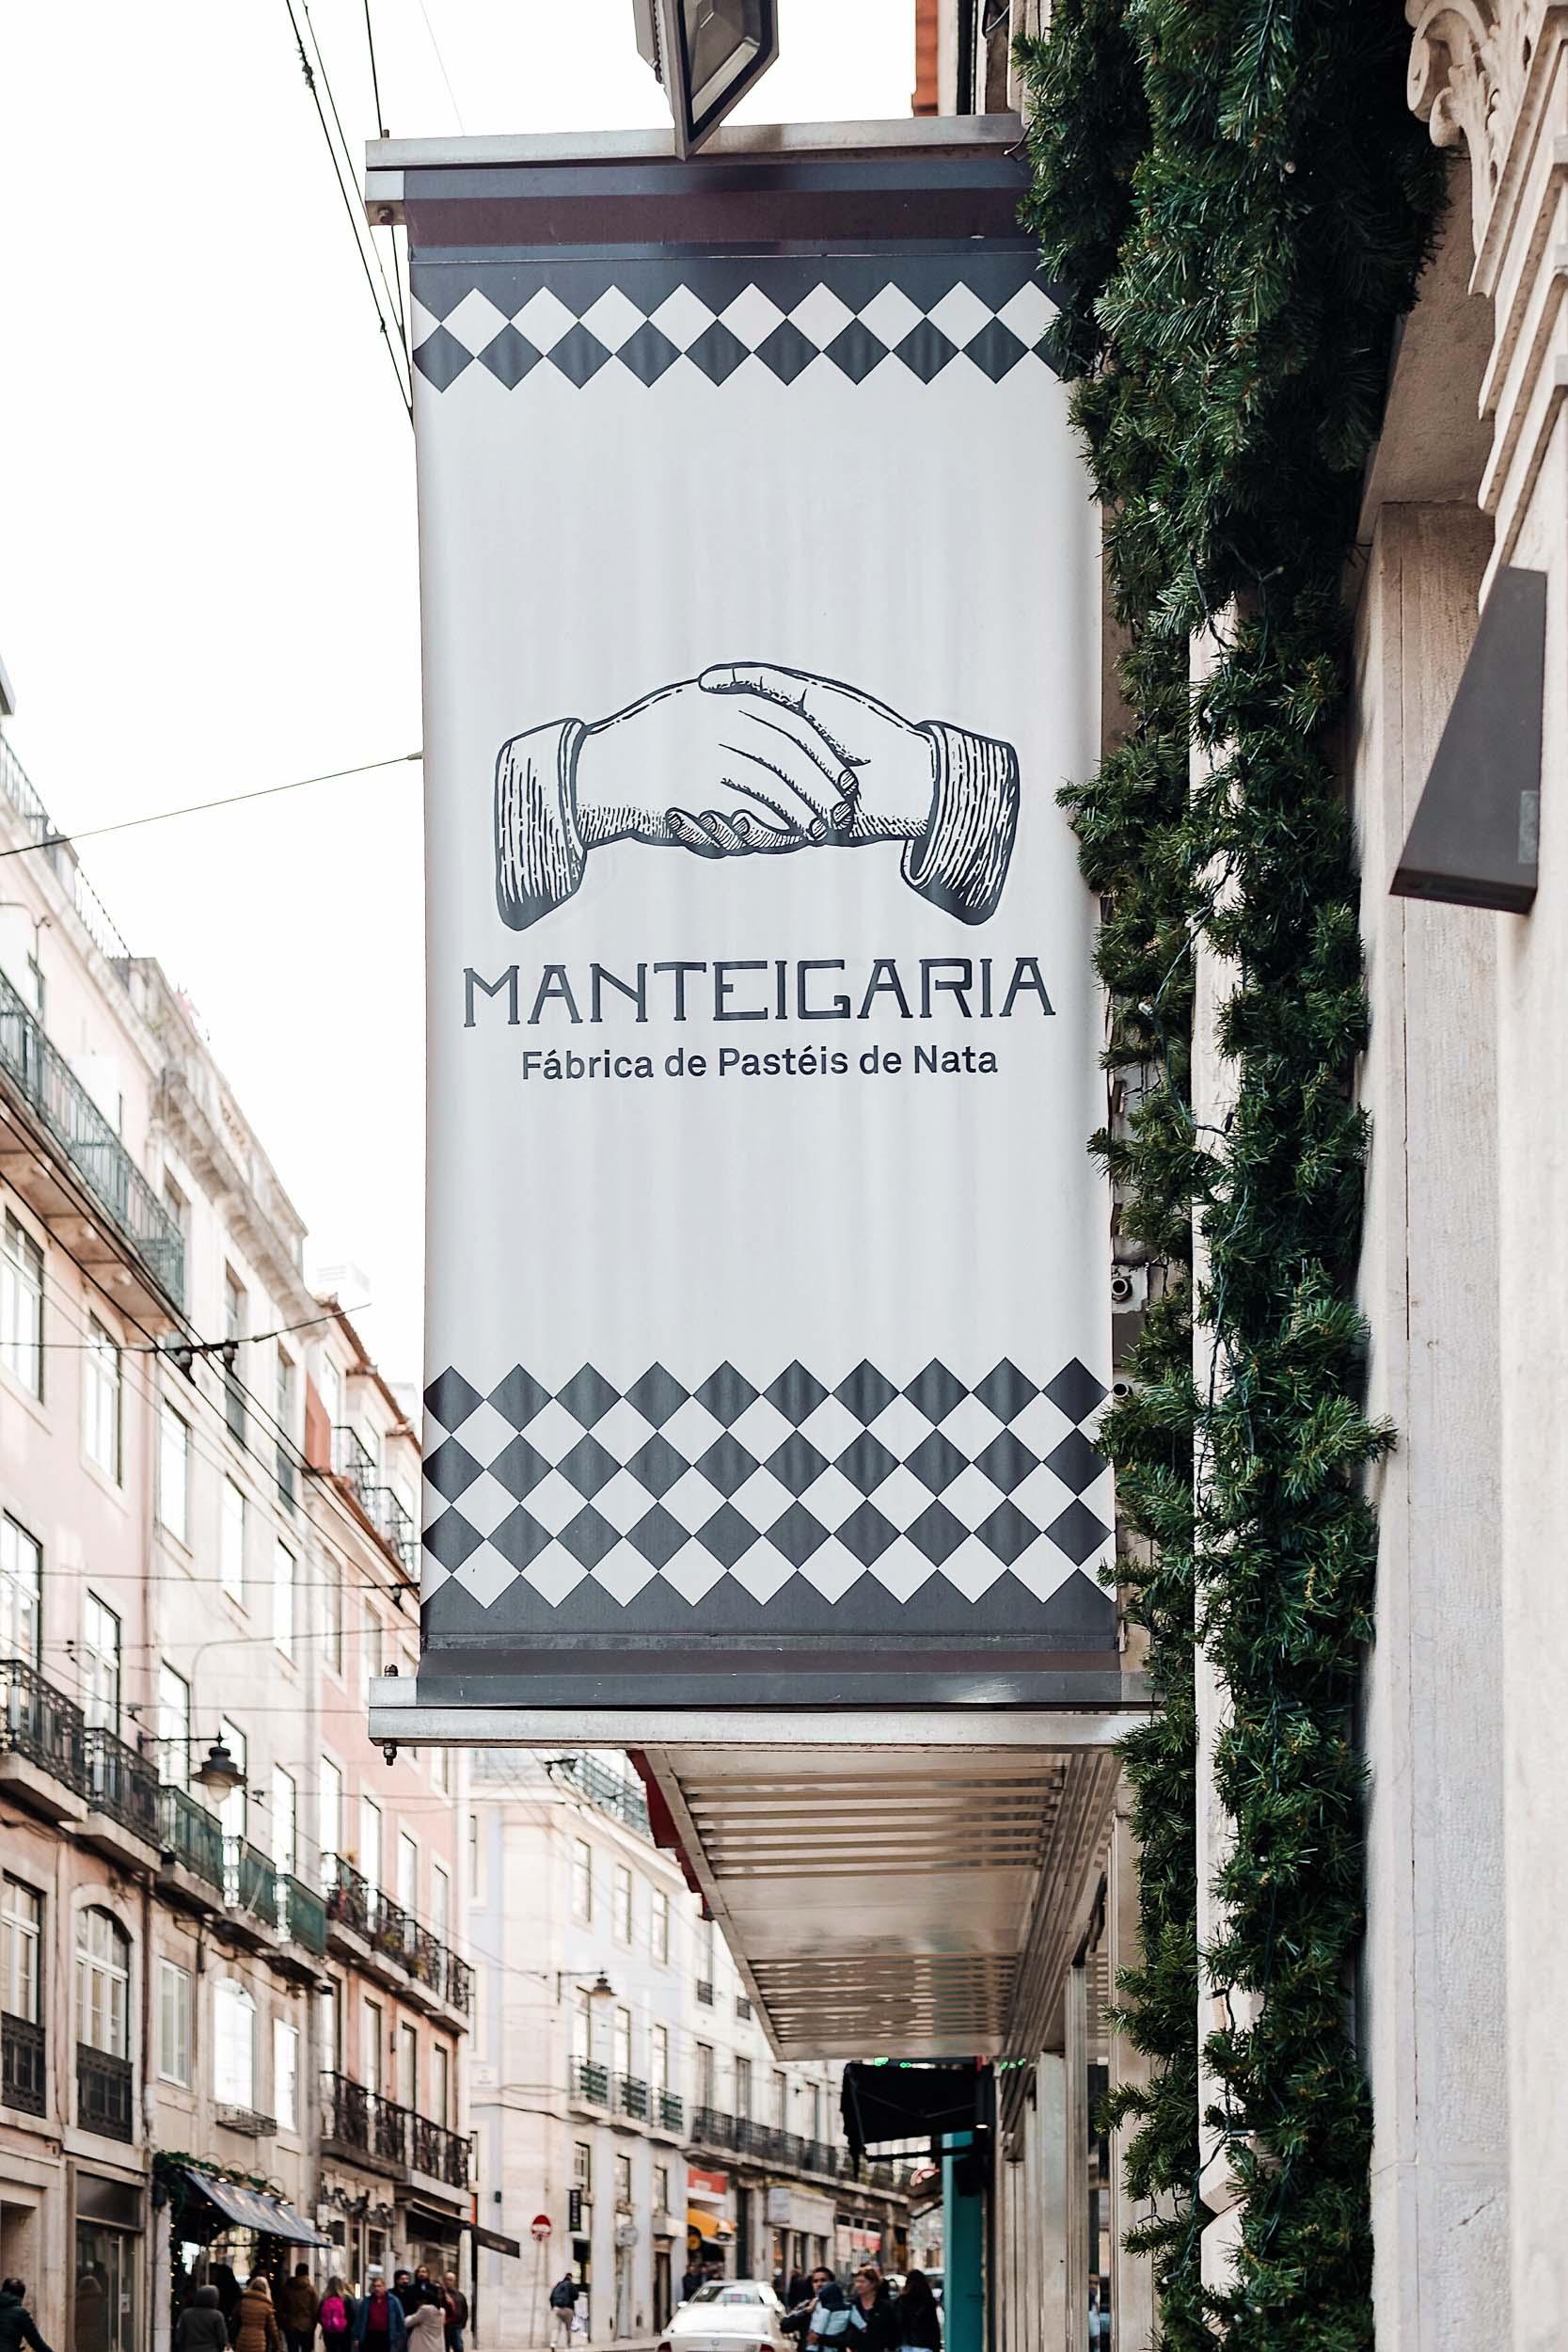 Manteigaria in Lisbon is famous for it's pastel de nata!  Don't miss it